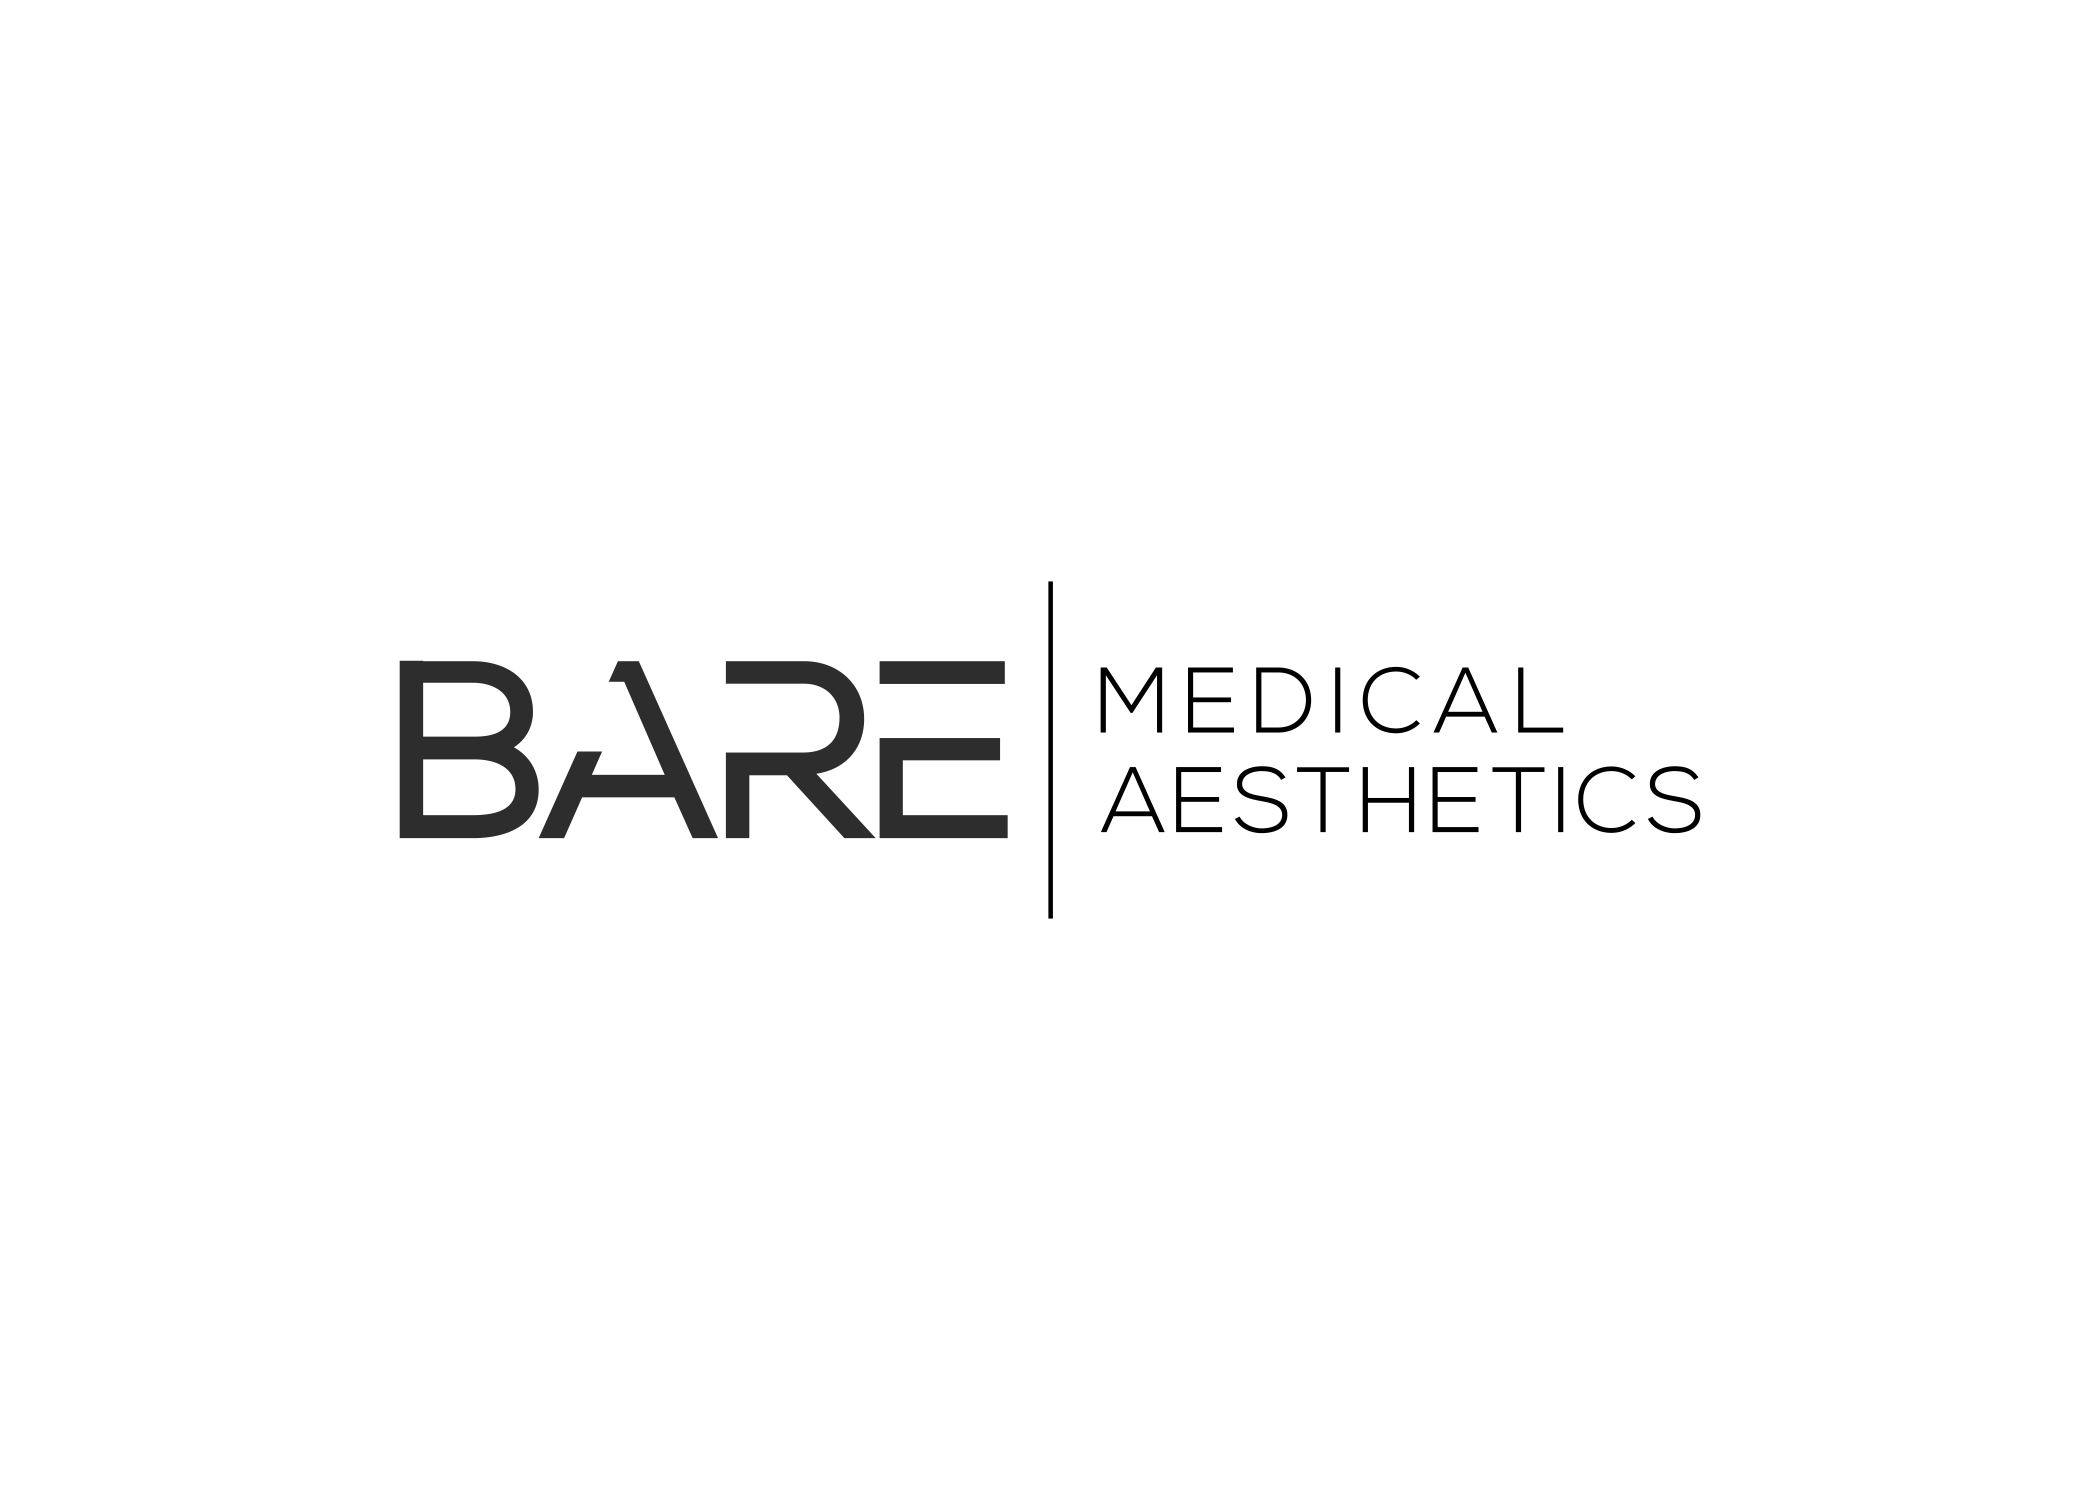 Bare Medical Aesthetics logo